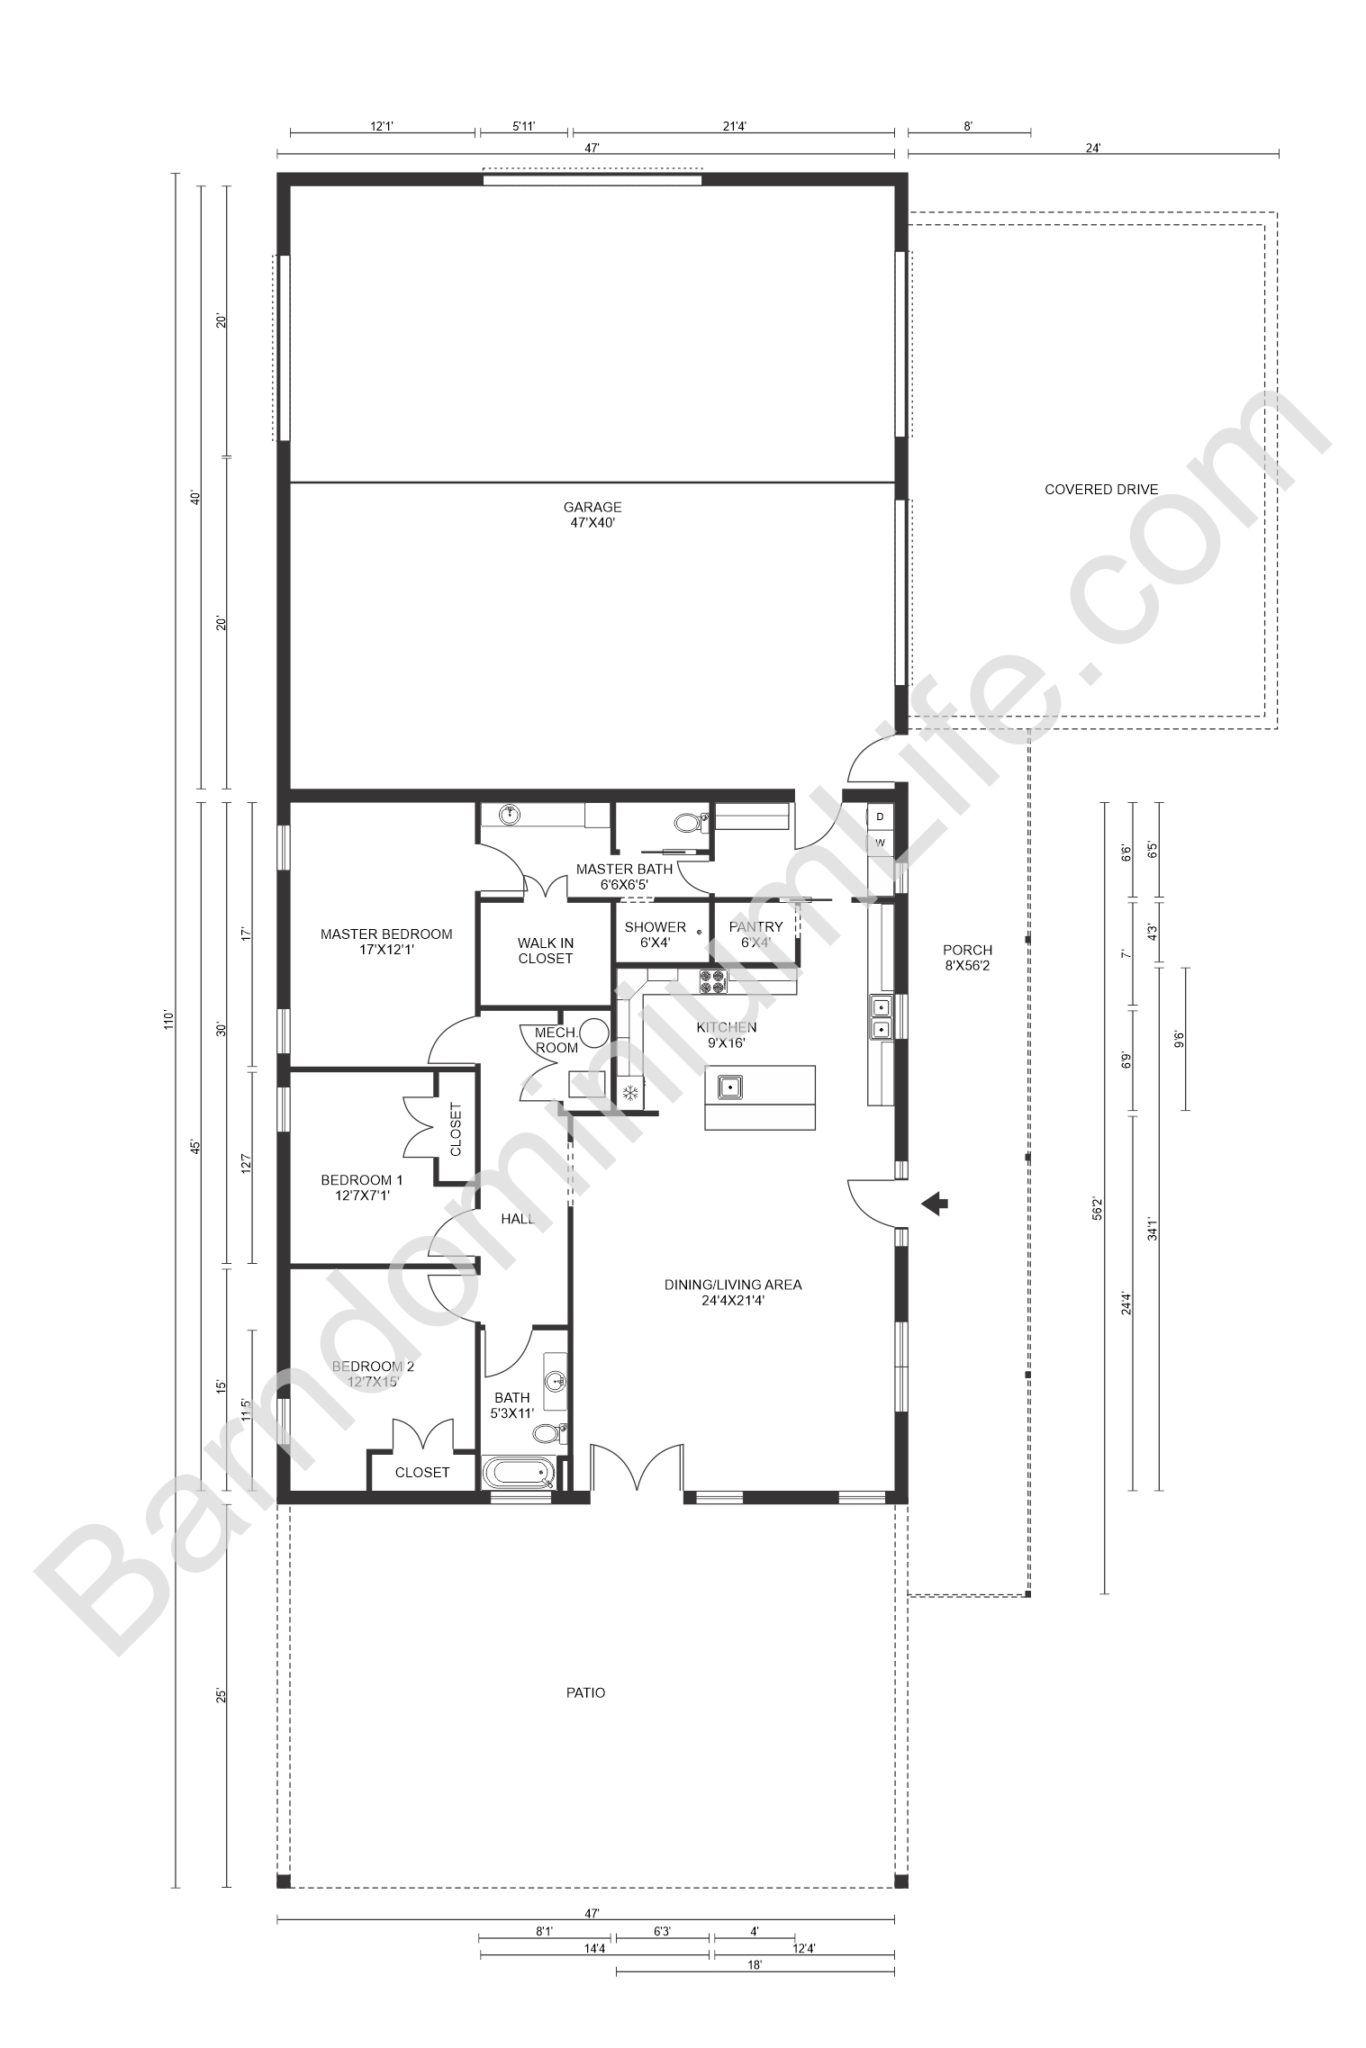 8 Inspiring Barndominium Floor Plans With Garage In 2020 Barndominium Floor Plans Floor Plans Barndominium